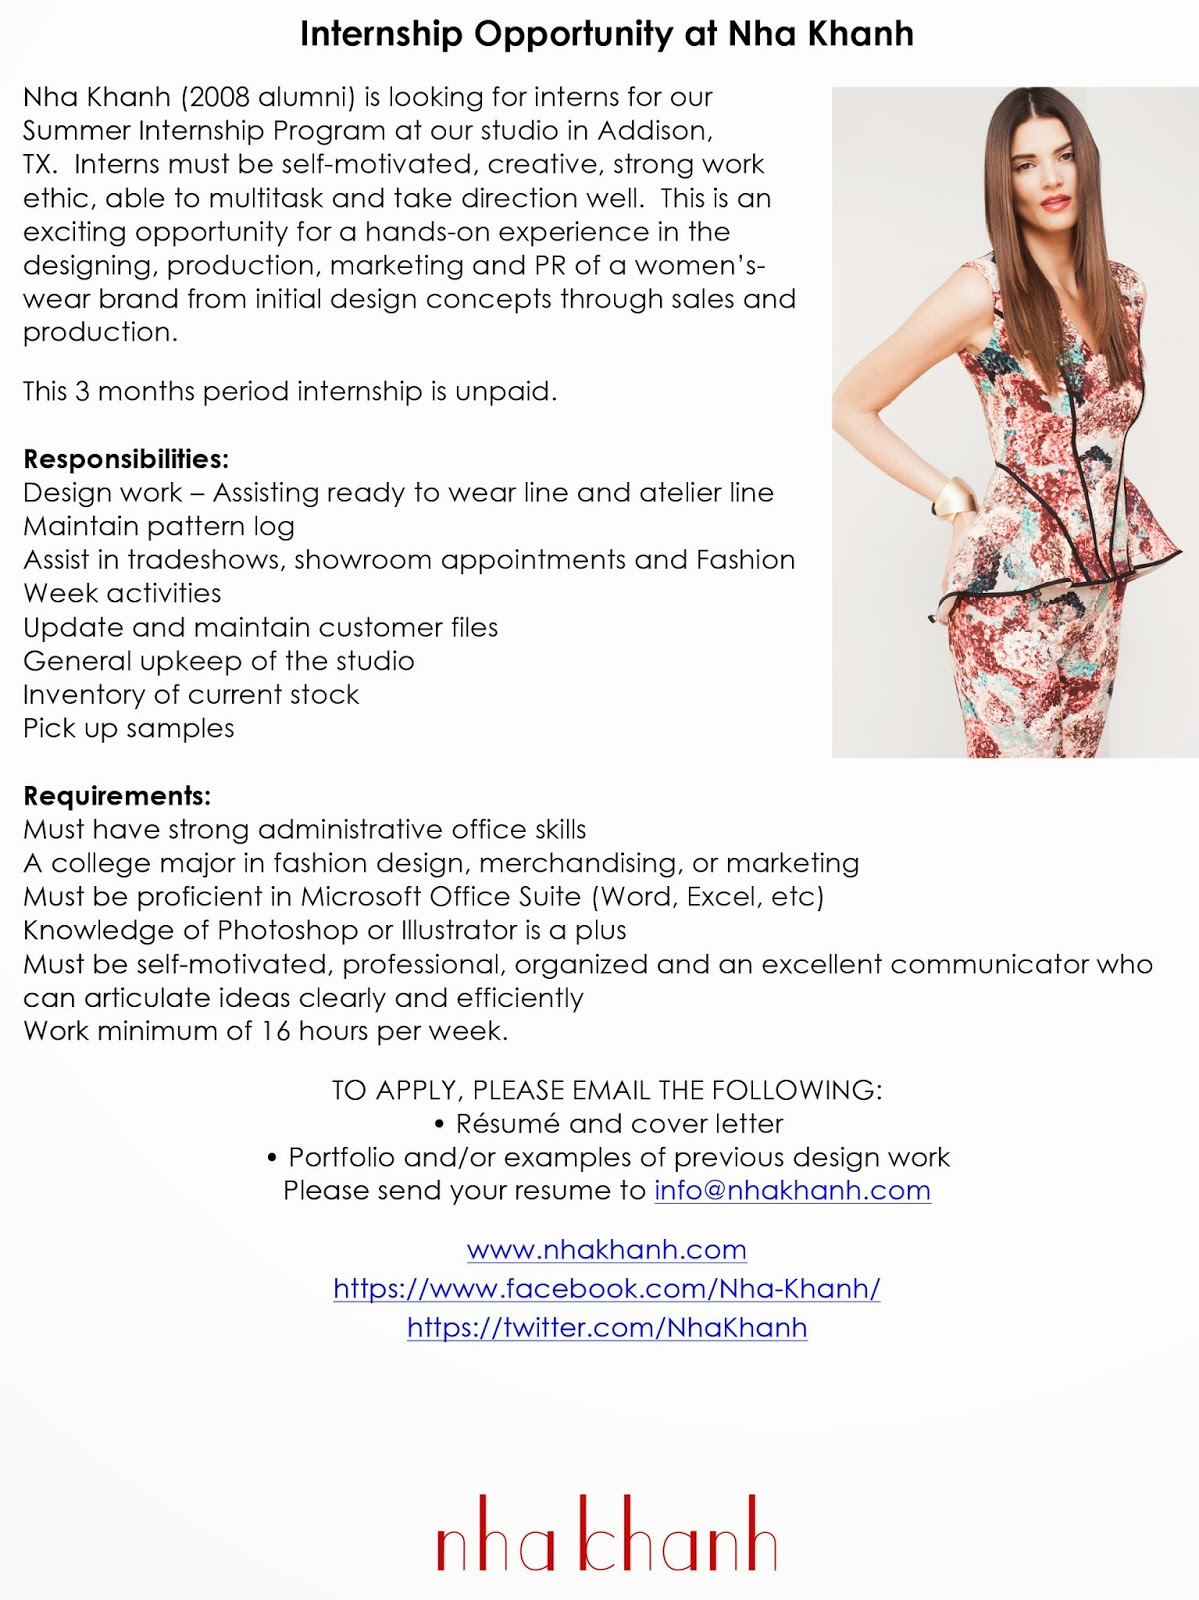 Internship Opportunity At Nha Khanh Fashion Design